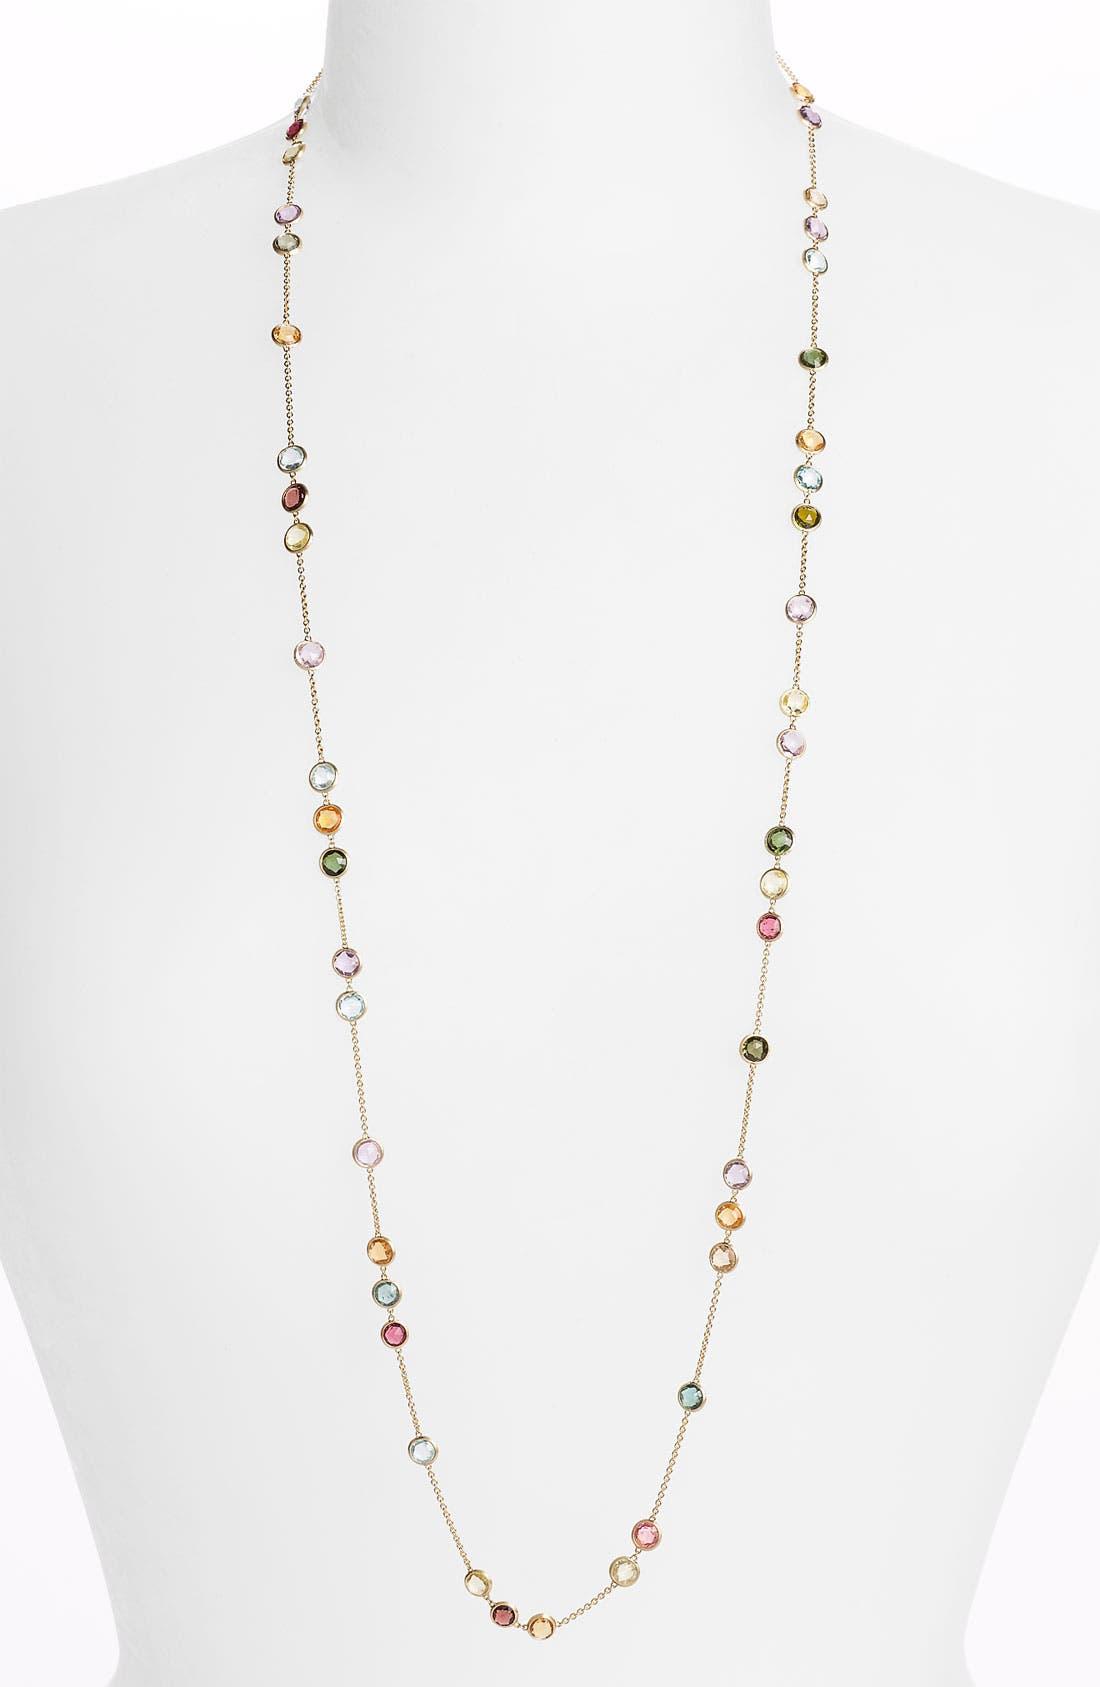 Alternate Image 1 Selected - Marco Bicego 'Mini Jaipur' Long Station Necklace